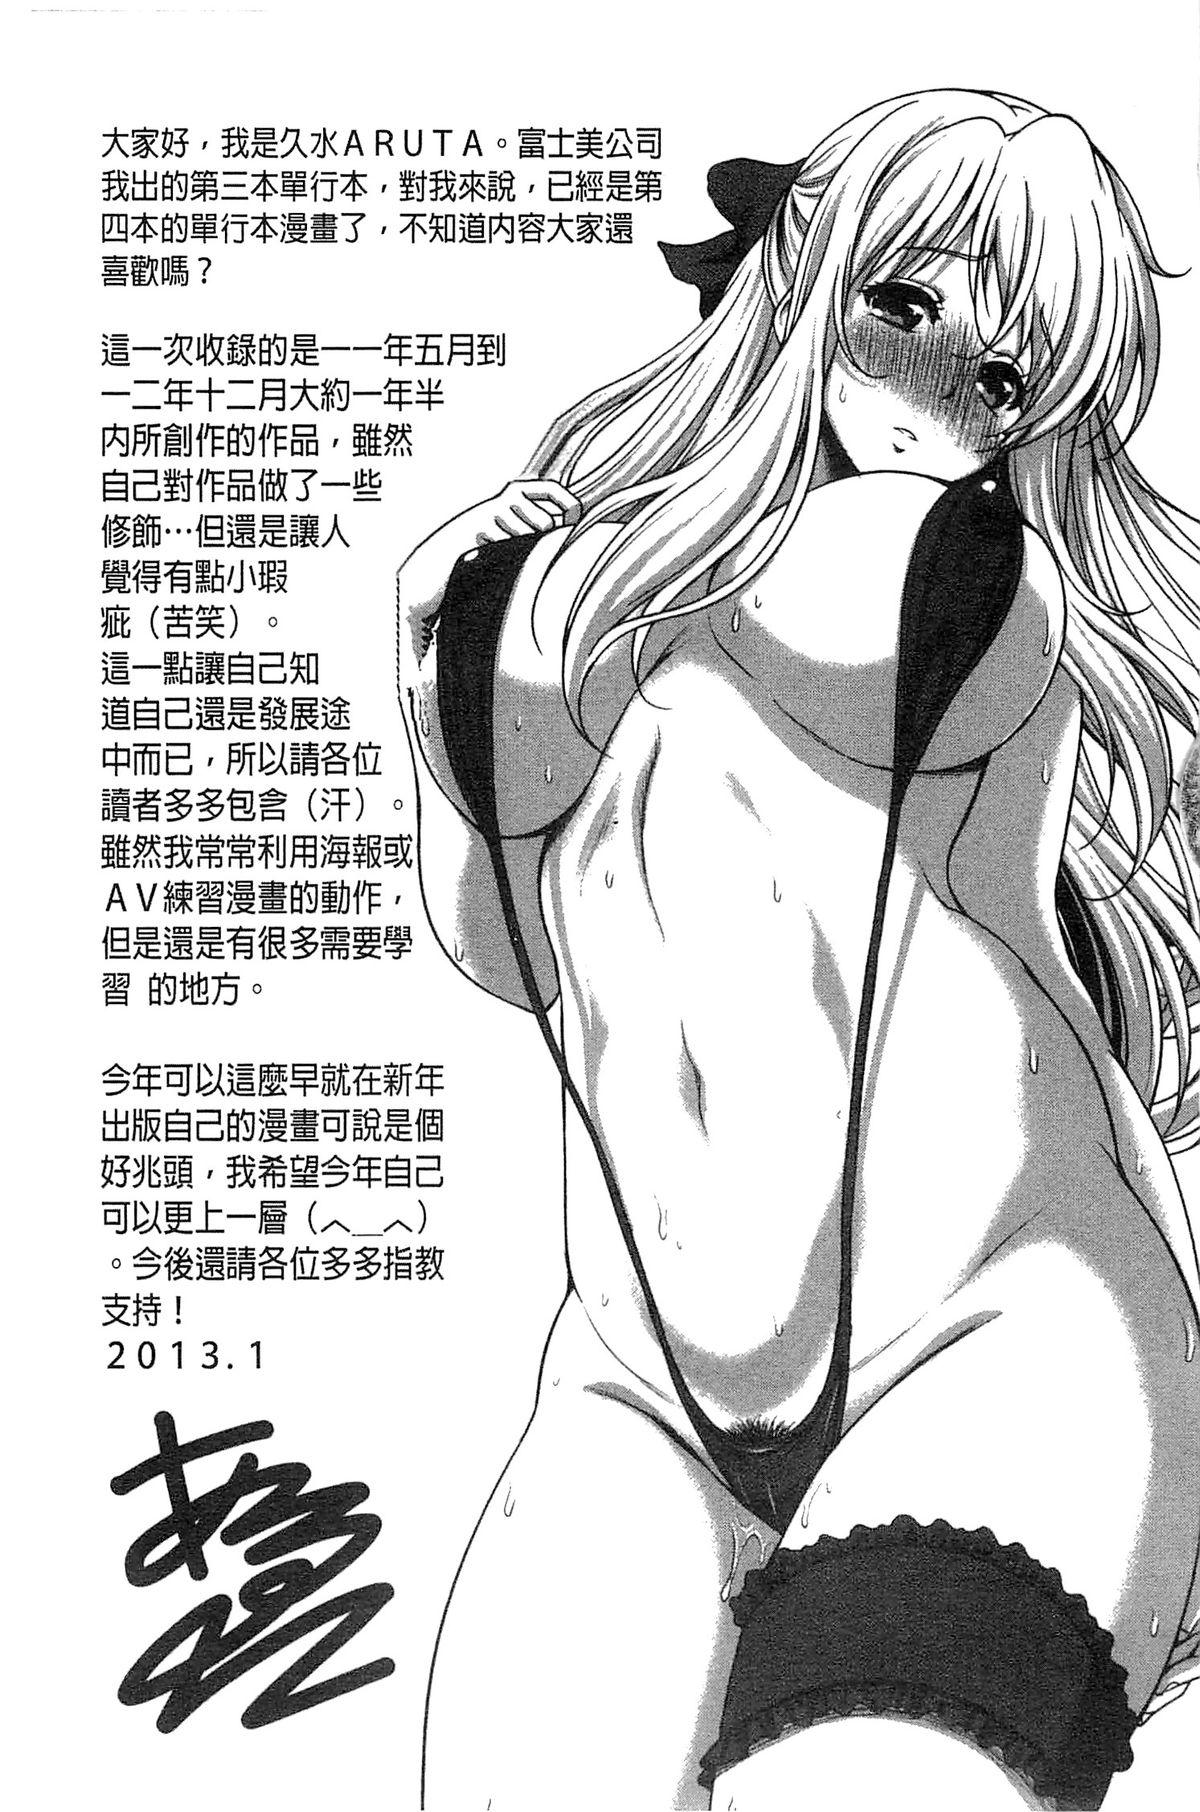 Hajimete nan dakara - First sexual experience 203